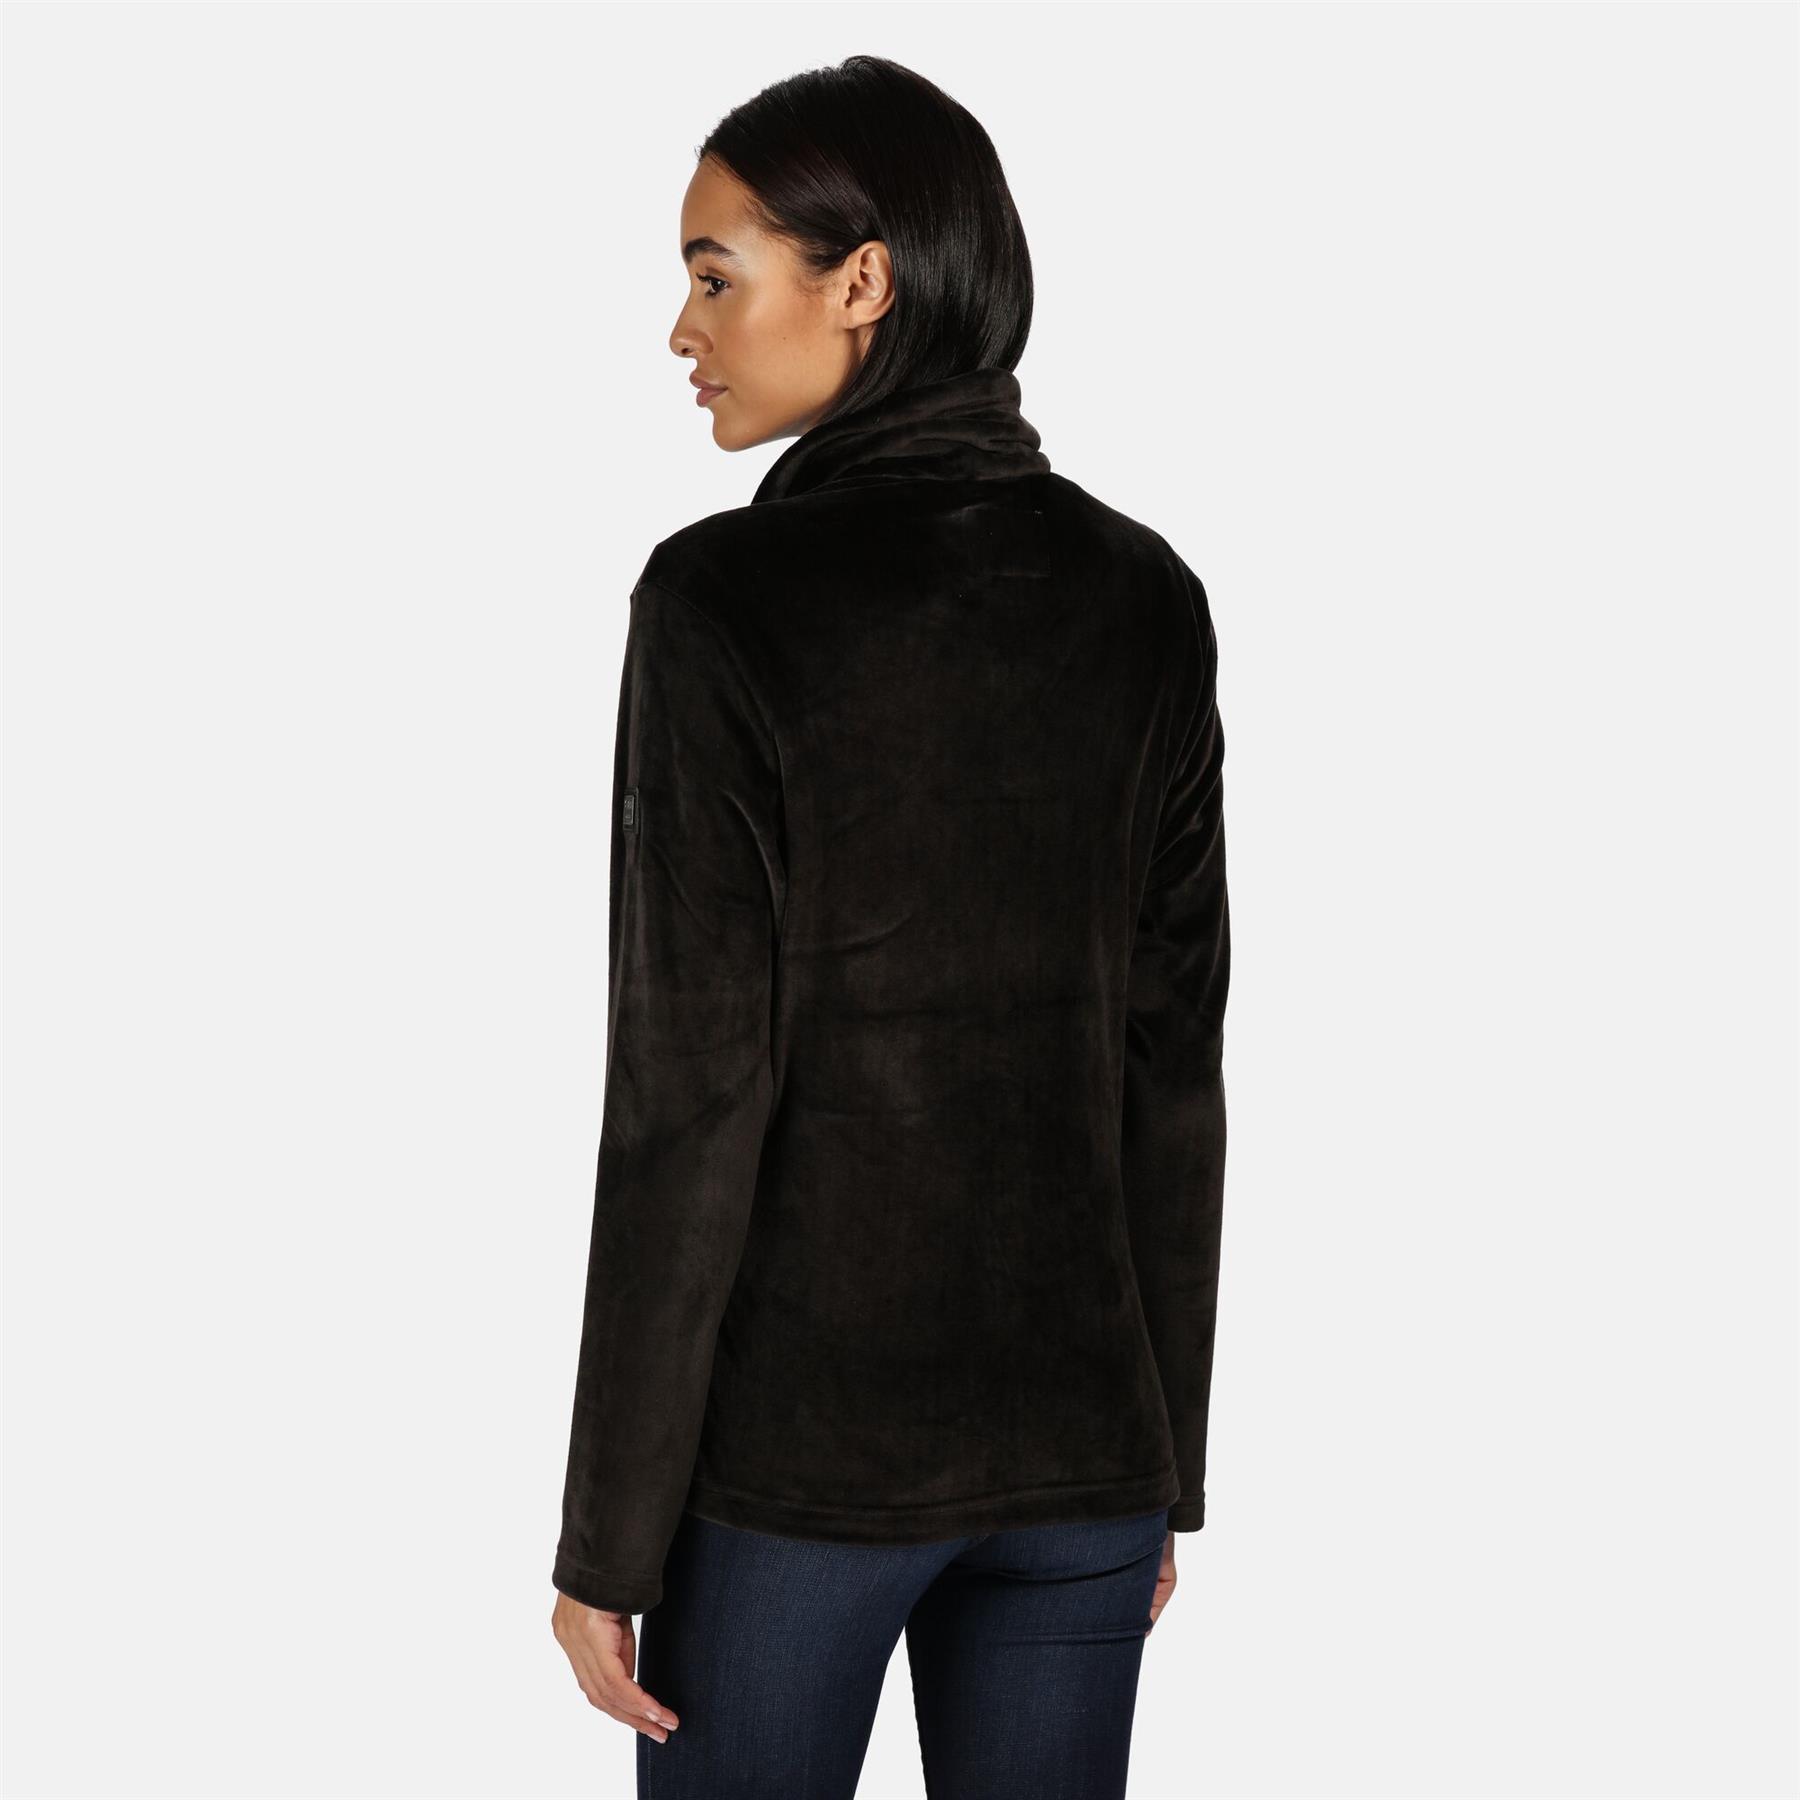 Regatta Hermilla Full Zip Fleece with Two Lower Welt Pockets Forro Polar Mujer